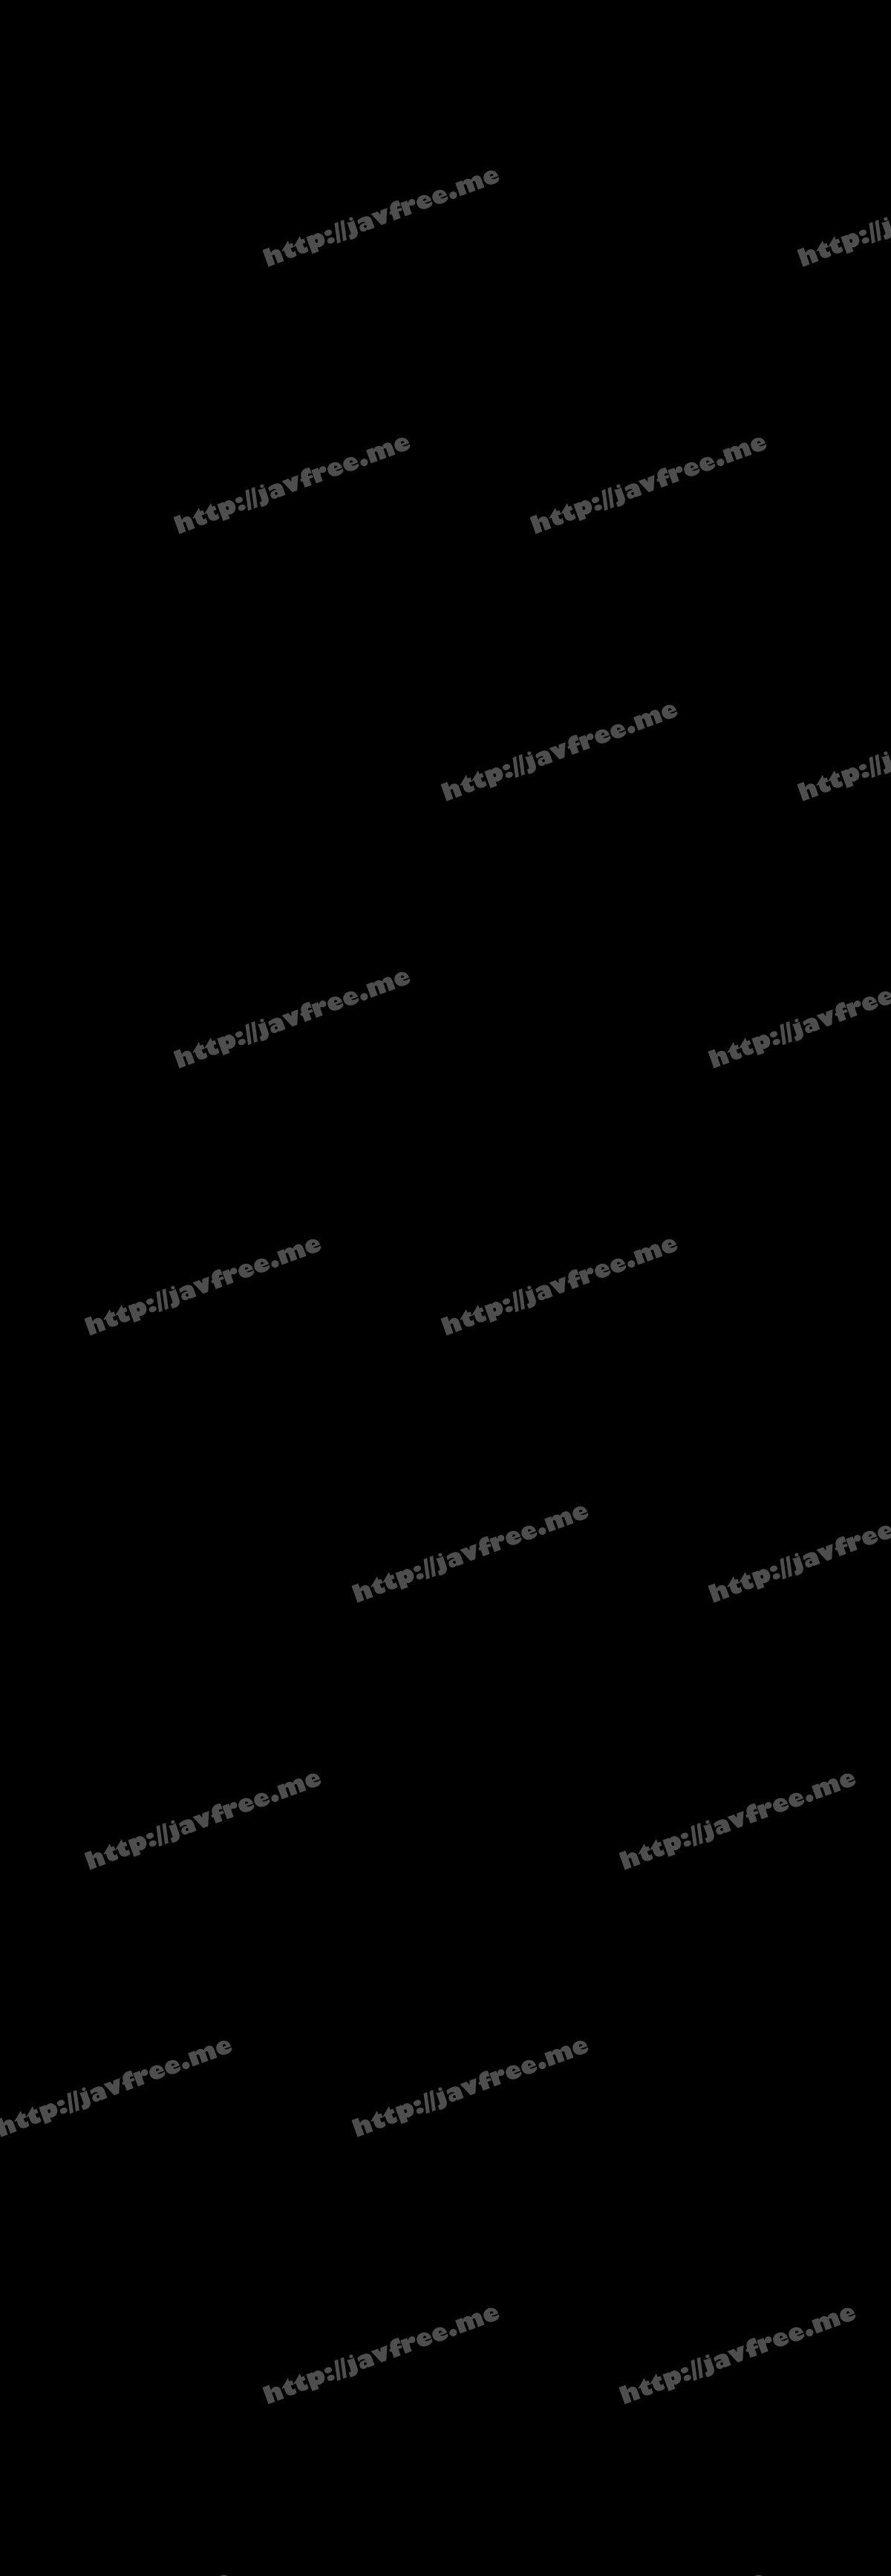 Heyzo 2083 平成生まれの素人パイパンおさな妻2穴依頼調教04 - image heyzo_hd_2083_full on https://javfree.me